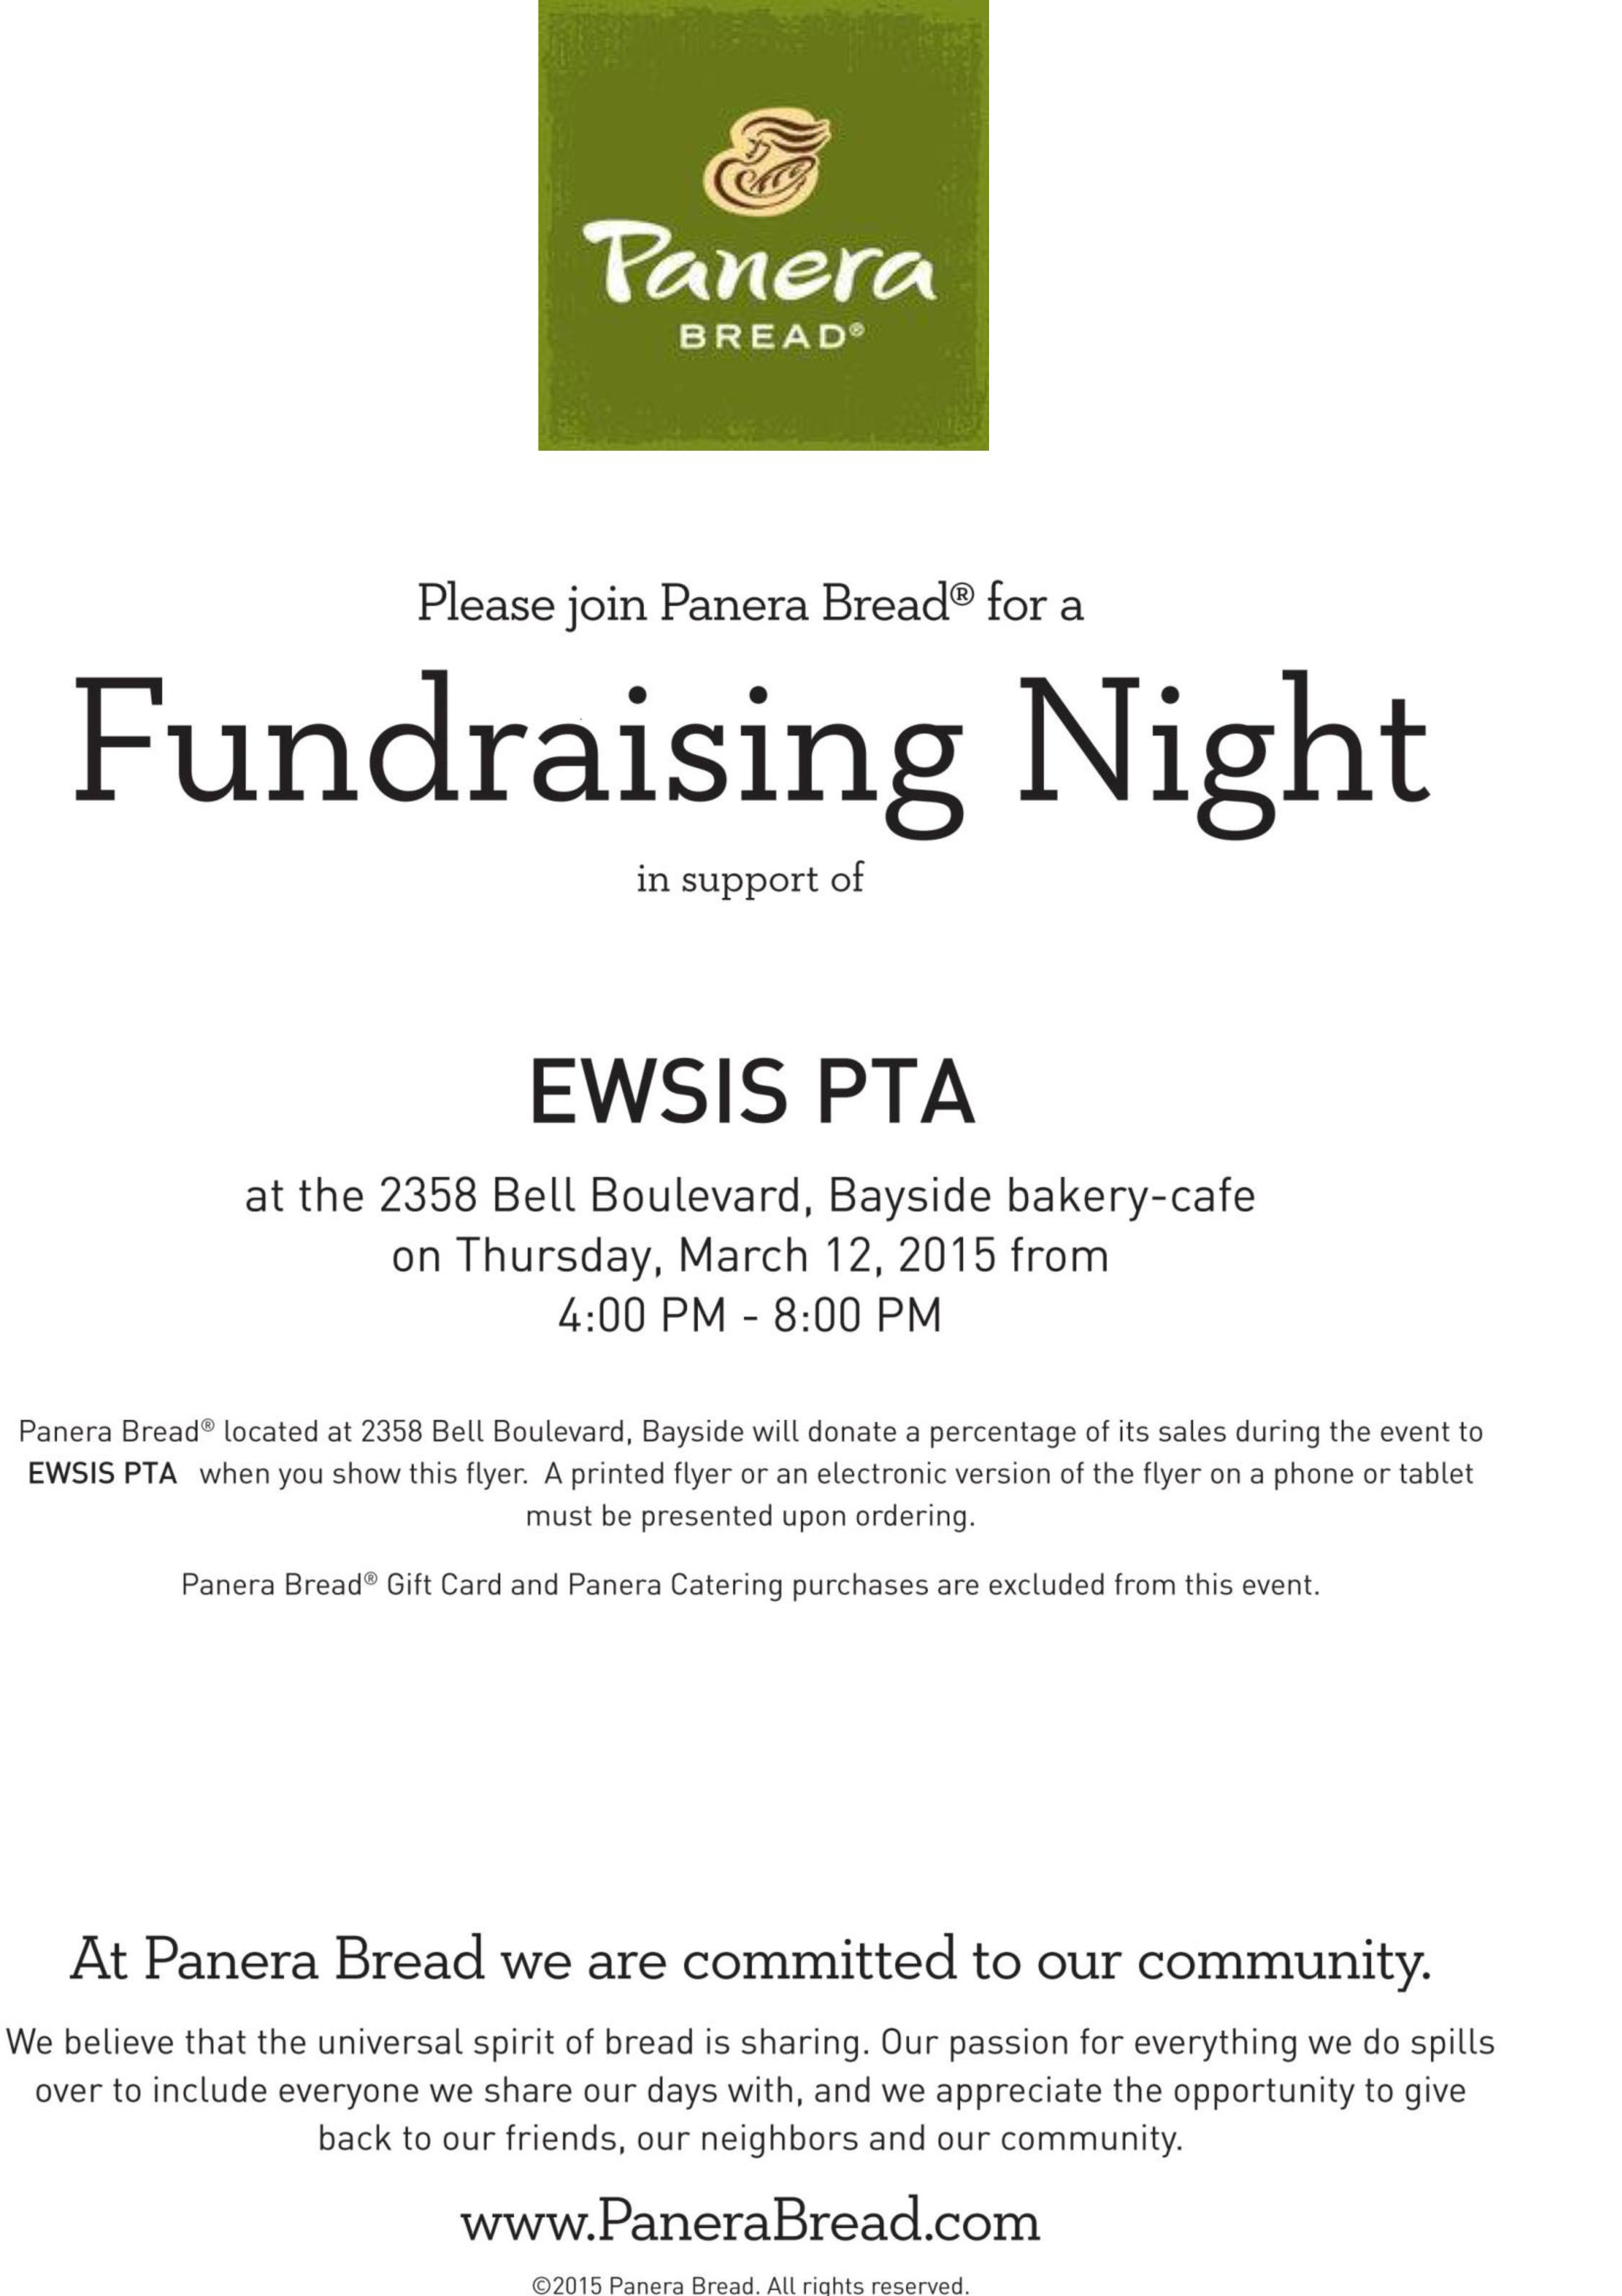 PTA Panera Bread Fundraiser | East-West School of International Studies